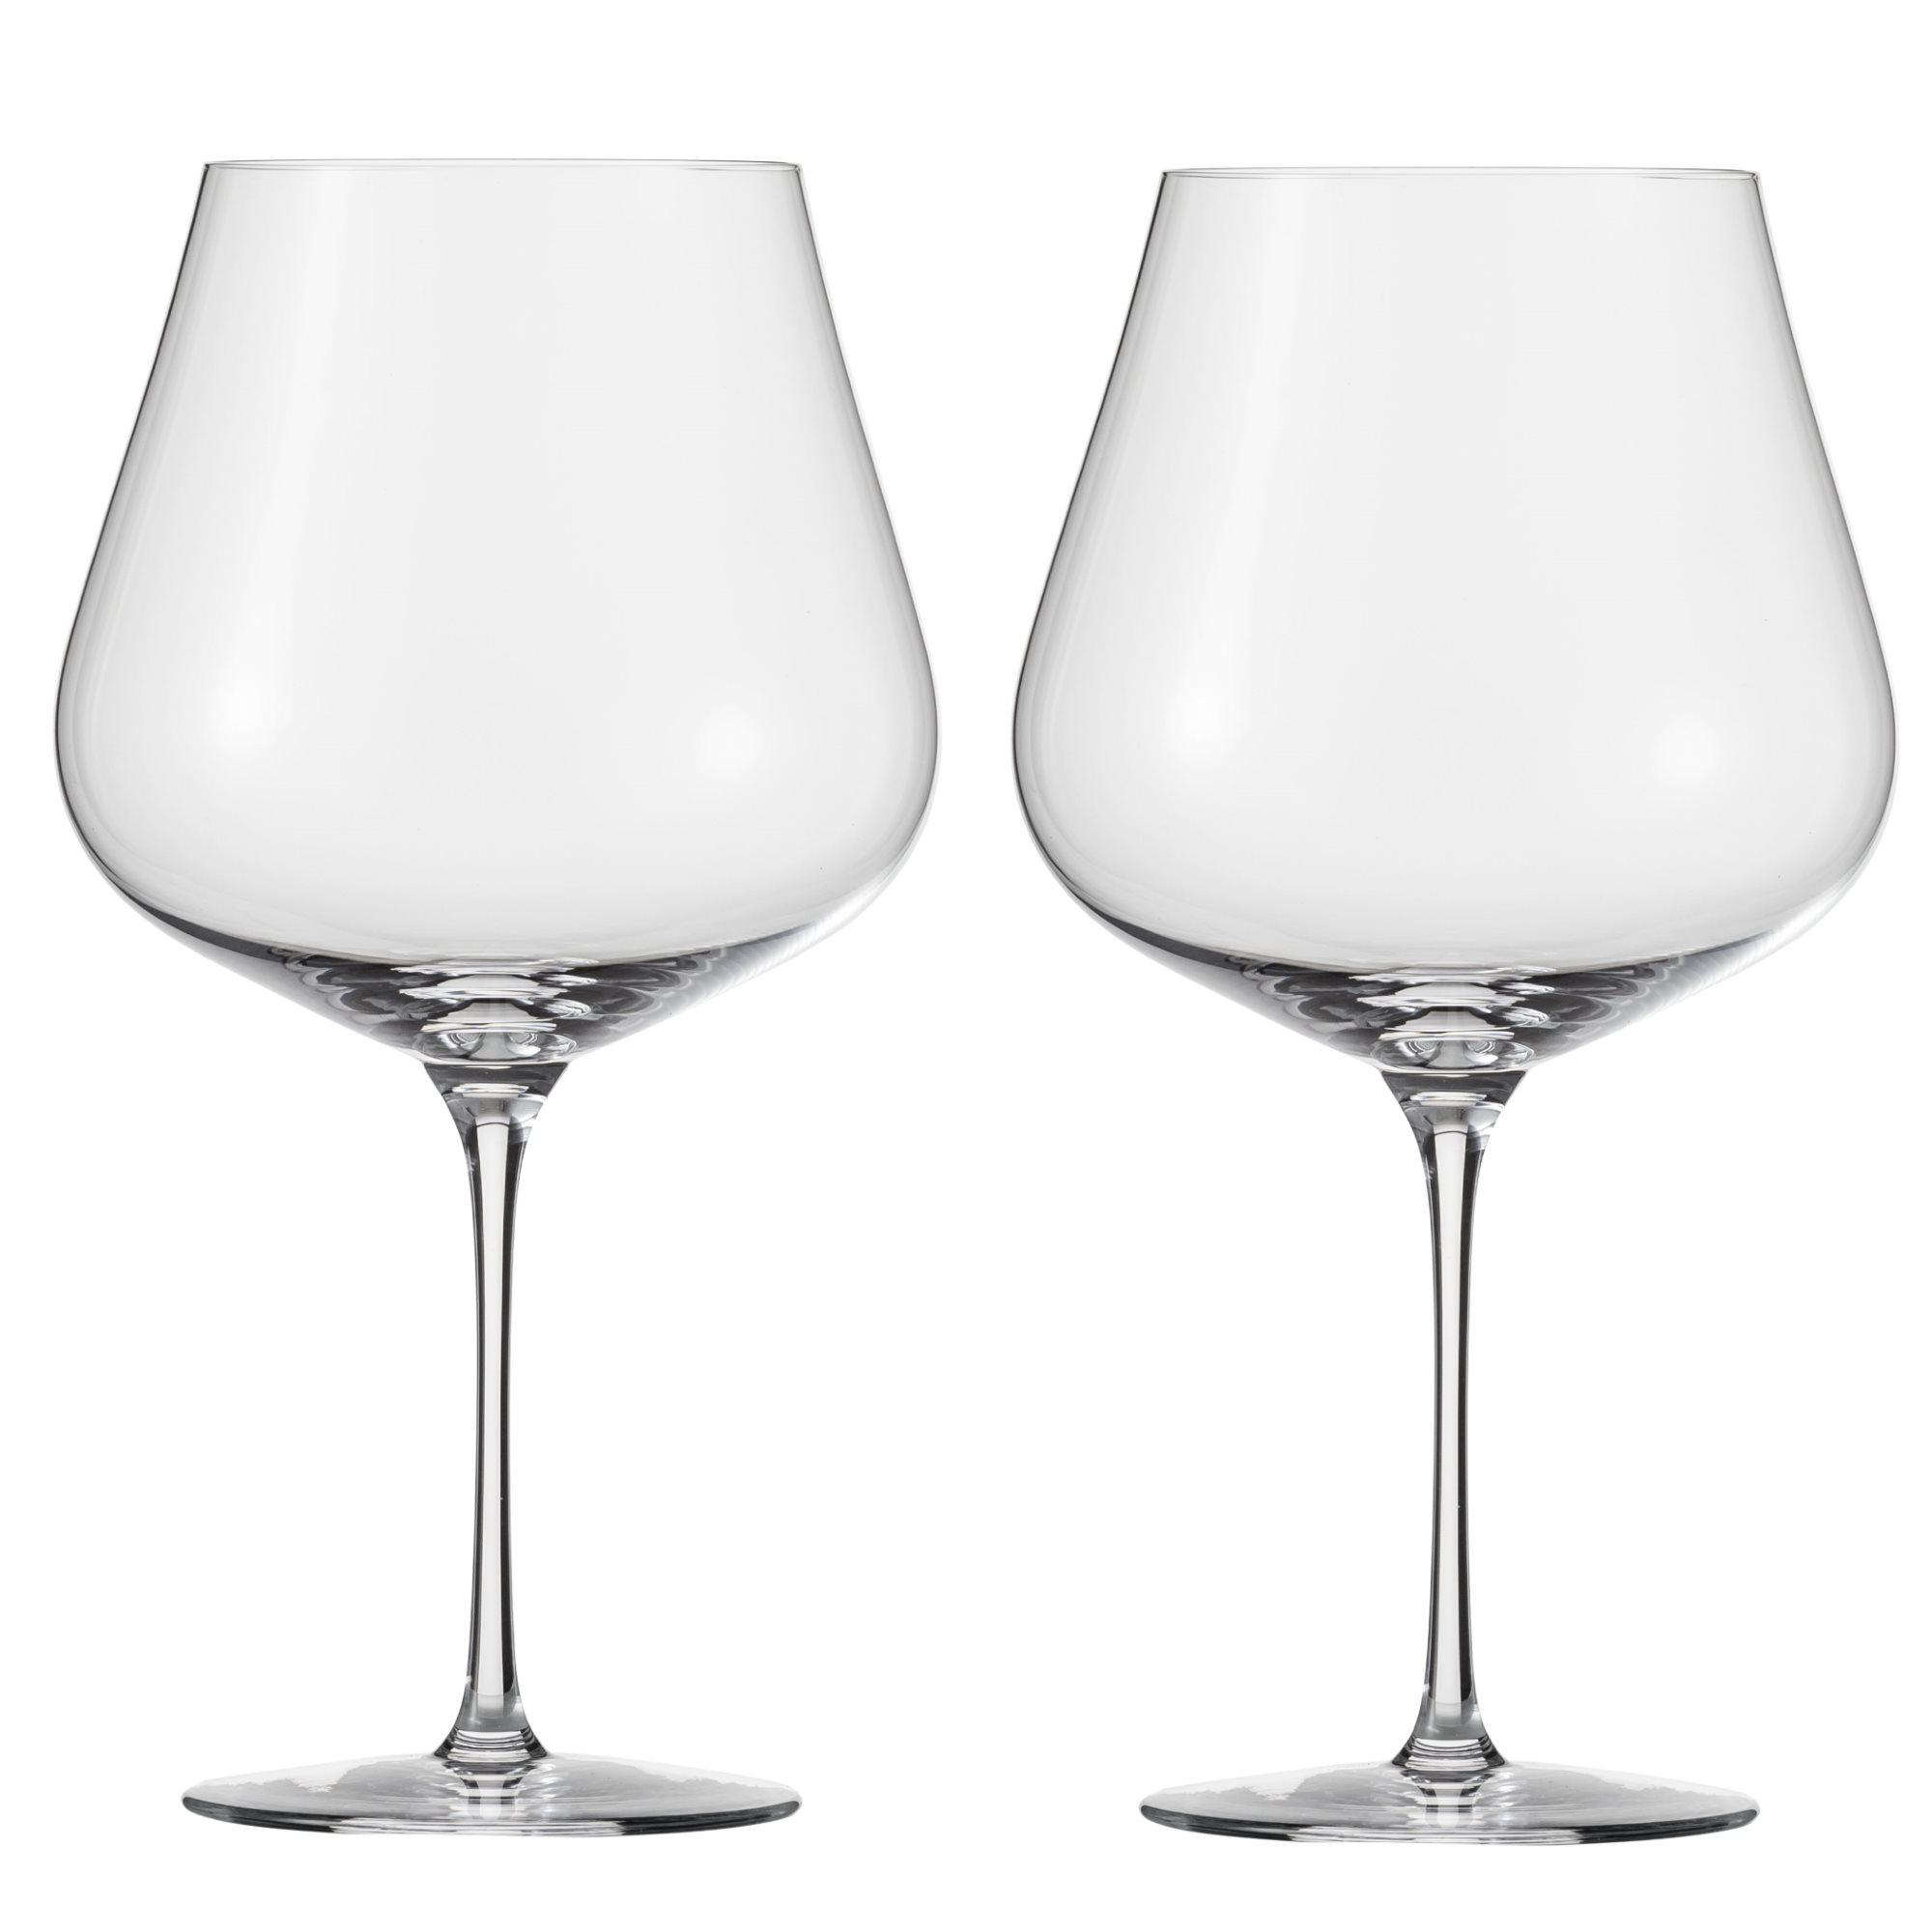 schott zwiesel serie air burgunderglas 2er set inhalt 782 ml burgunder rotweingl ser gl ser. Black Bedroom Furniture Sets. Home Design Ideas